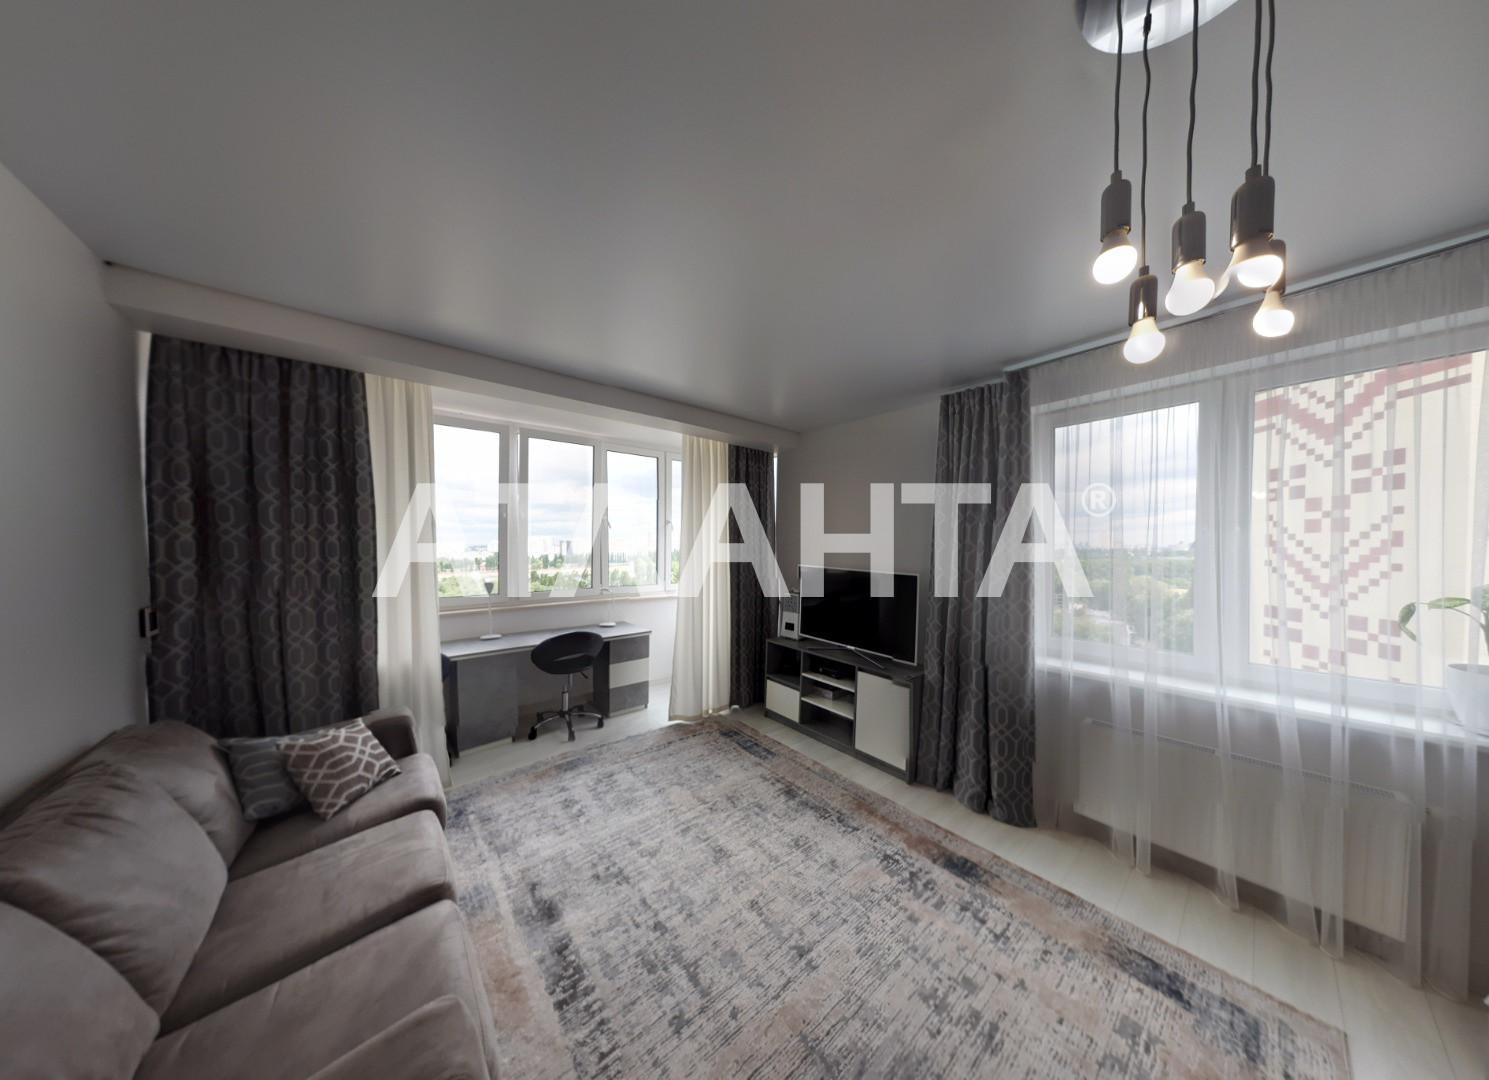 Продается 3-комнатная Квартира на ул. Просп. Глушкова — 160 000 у.е. (фото №15)